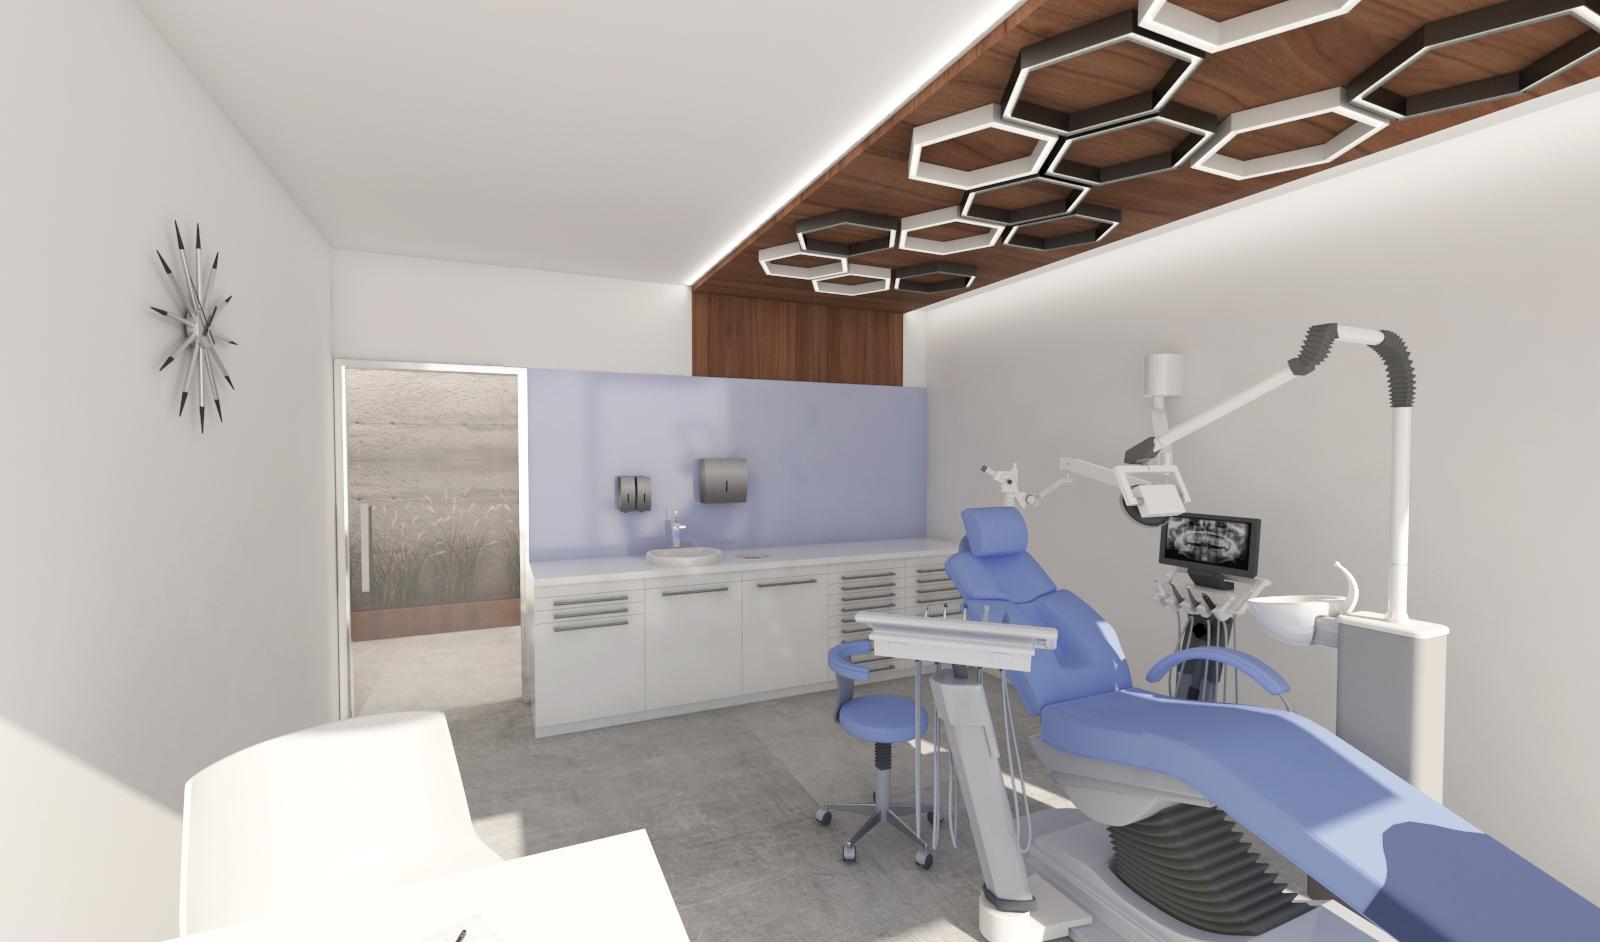 Nowoczesny gabinet stomatologiczny